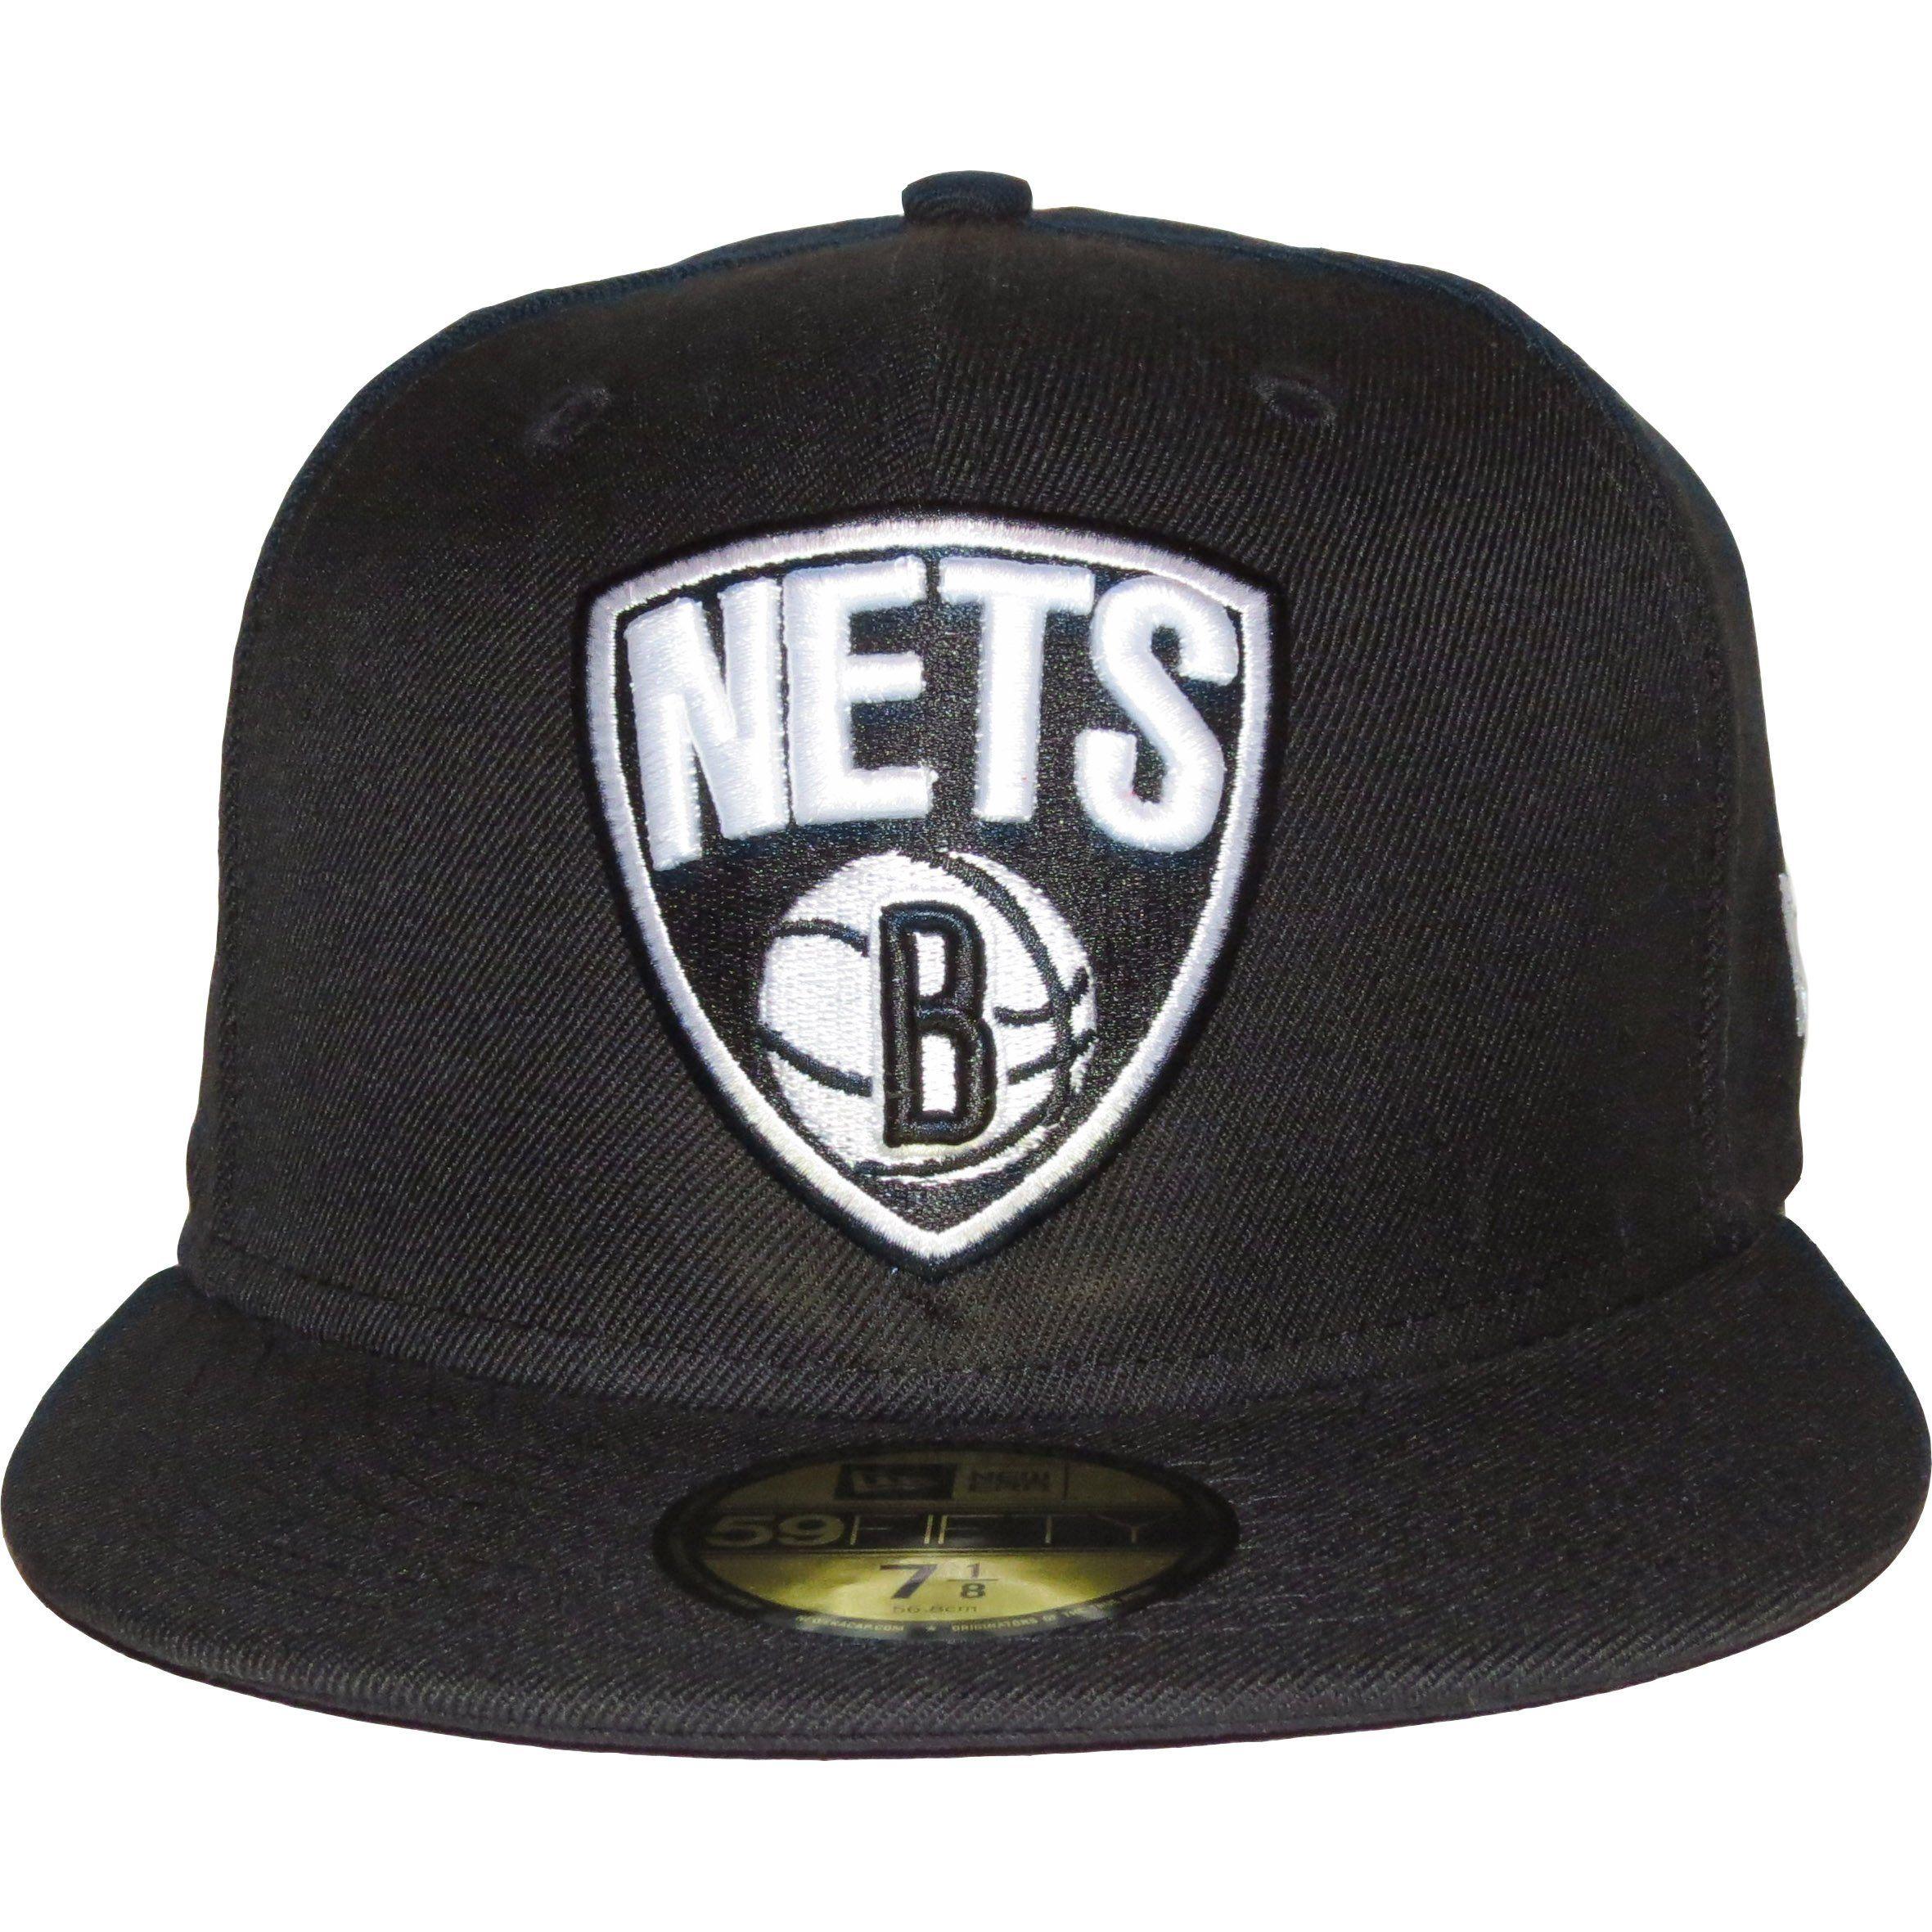 New Era 59Fifty NBA Team Basic 2 Brooklyn Nets Cap   New Era ... 6174282cde0